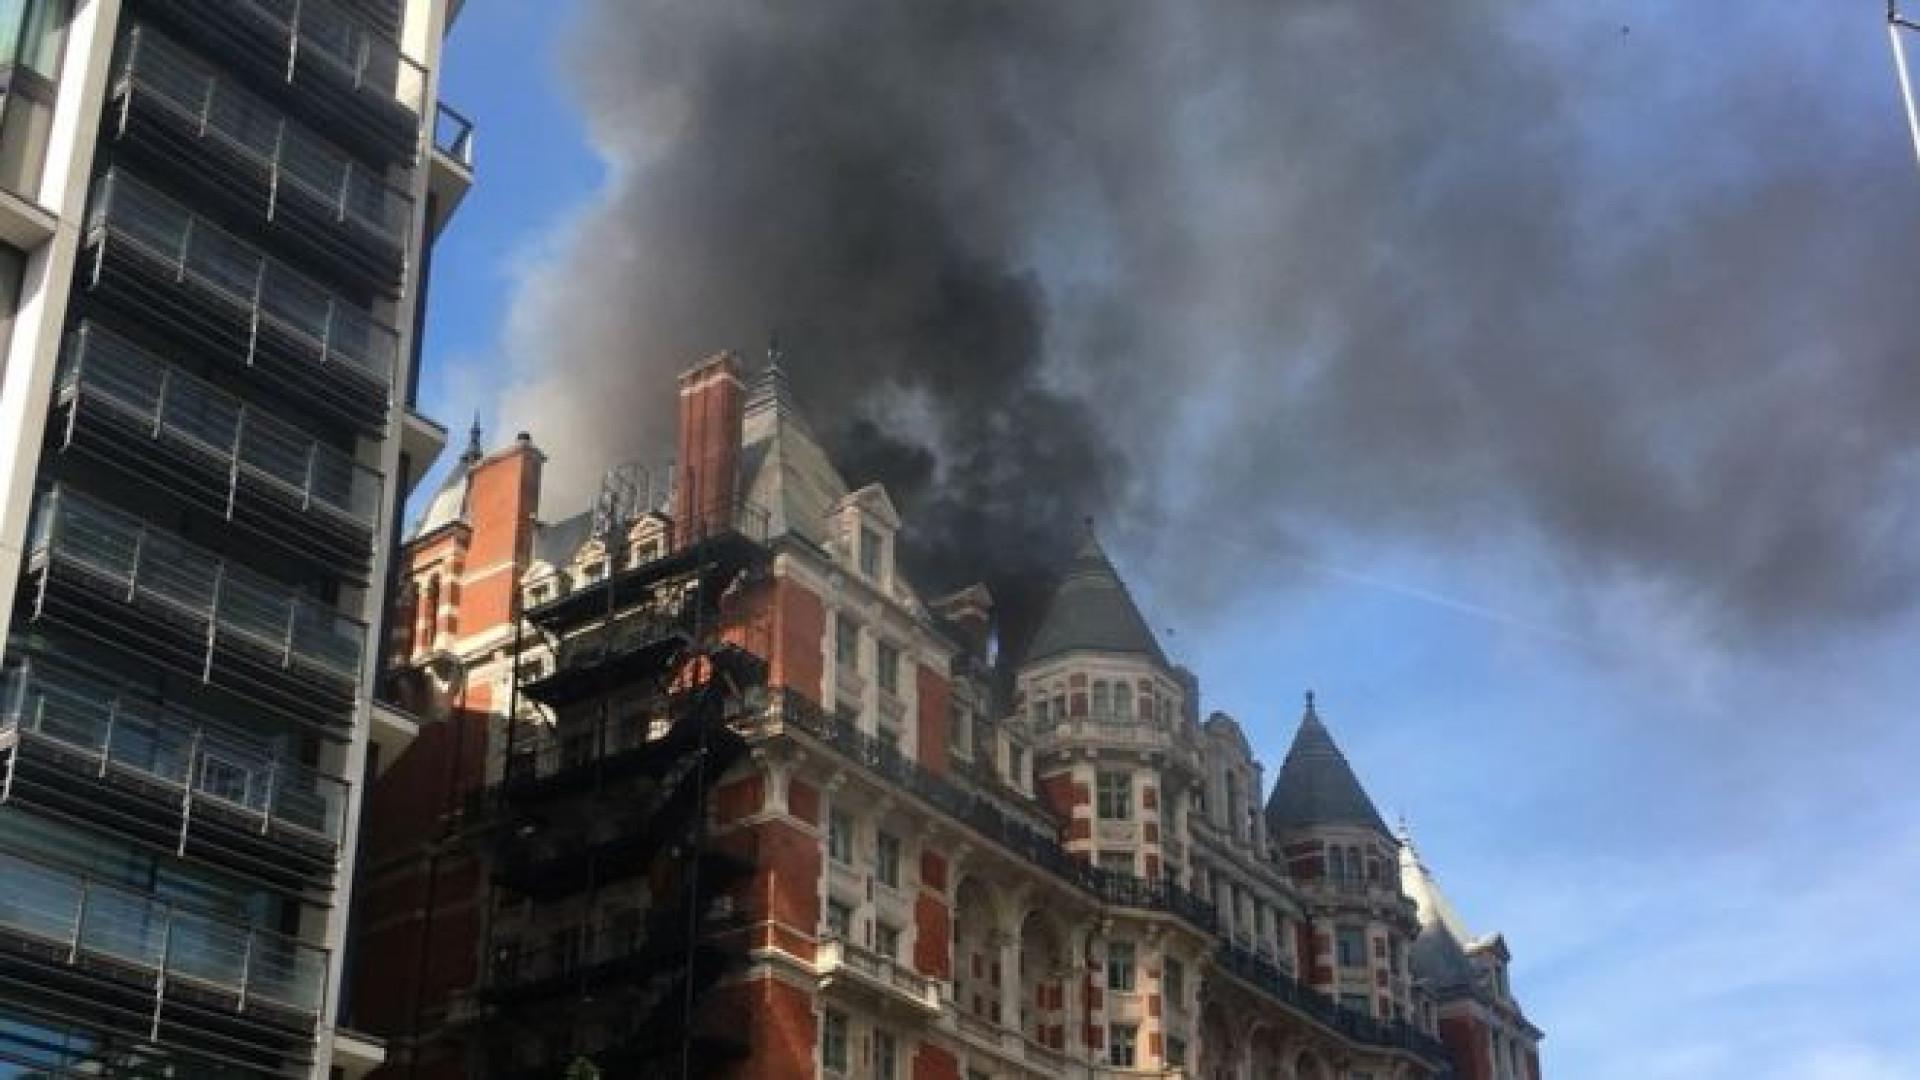 Hotel de luxo no centro de Londres consumido pelas chamas